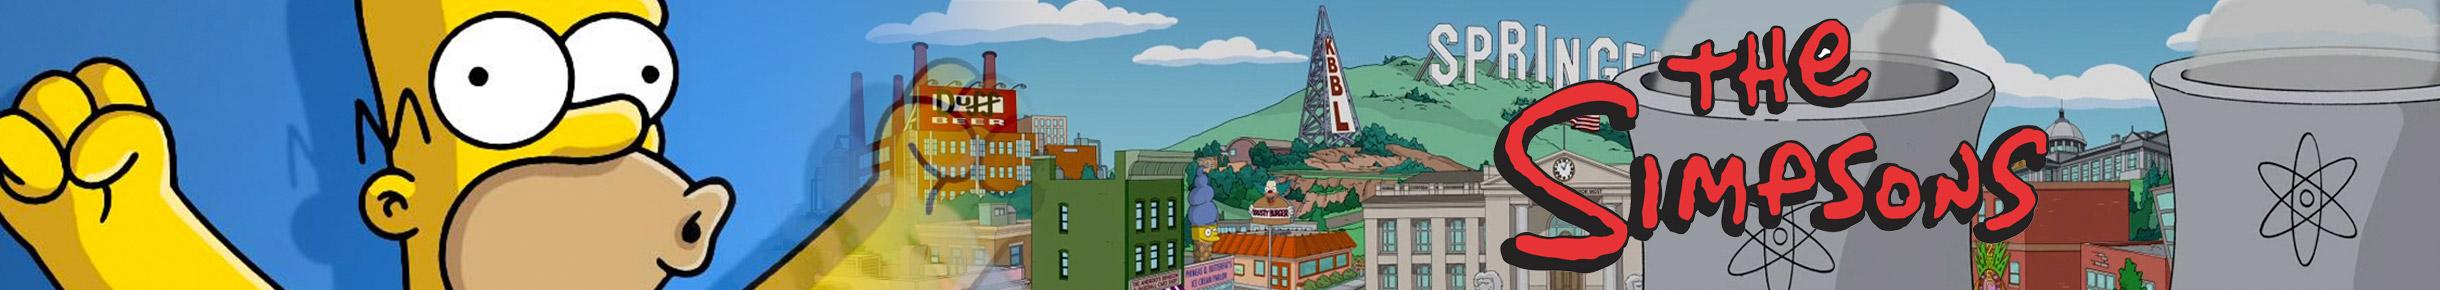 The Simpsons Merchandise Banner